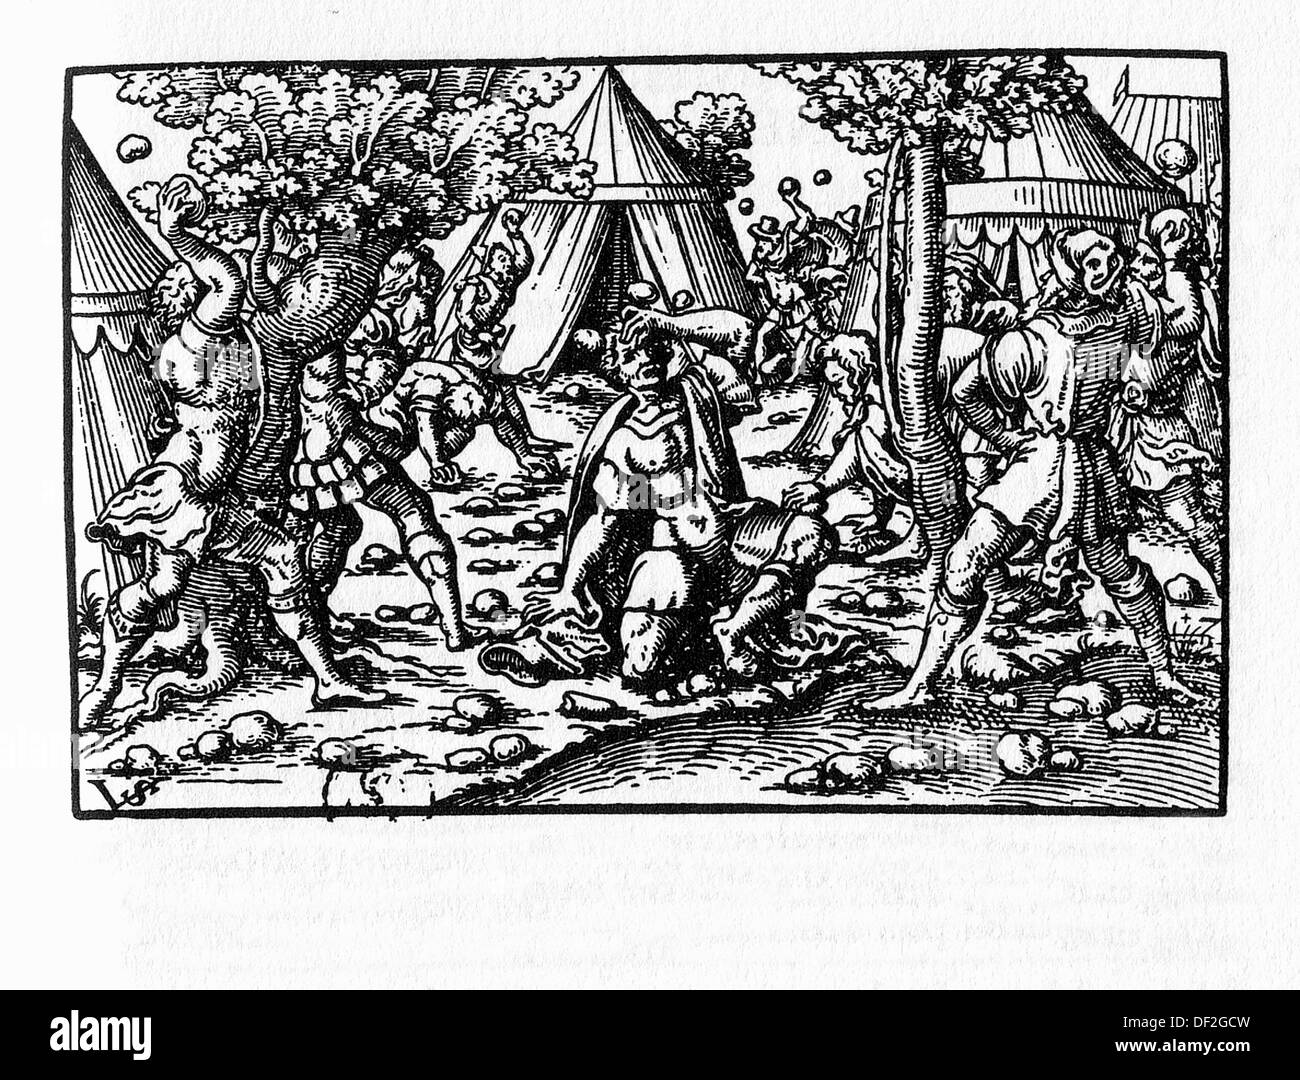 Lapidation of a culprit. German Bible, Frankfurt, 1570. - Stock Image